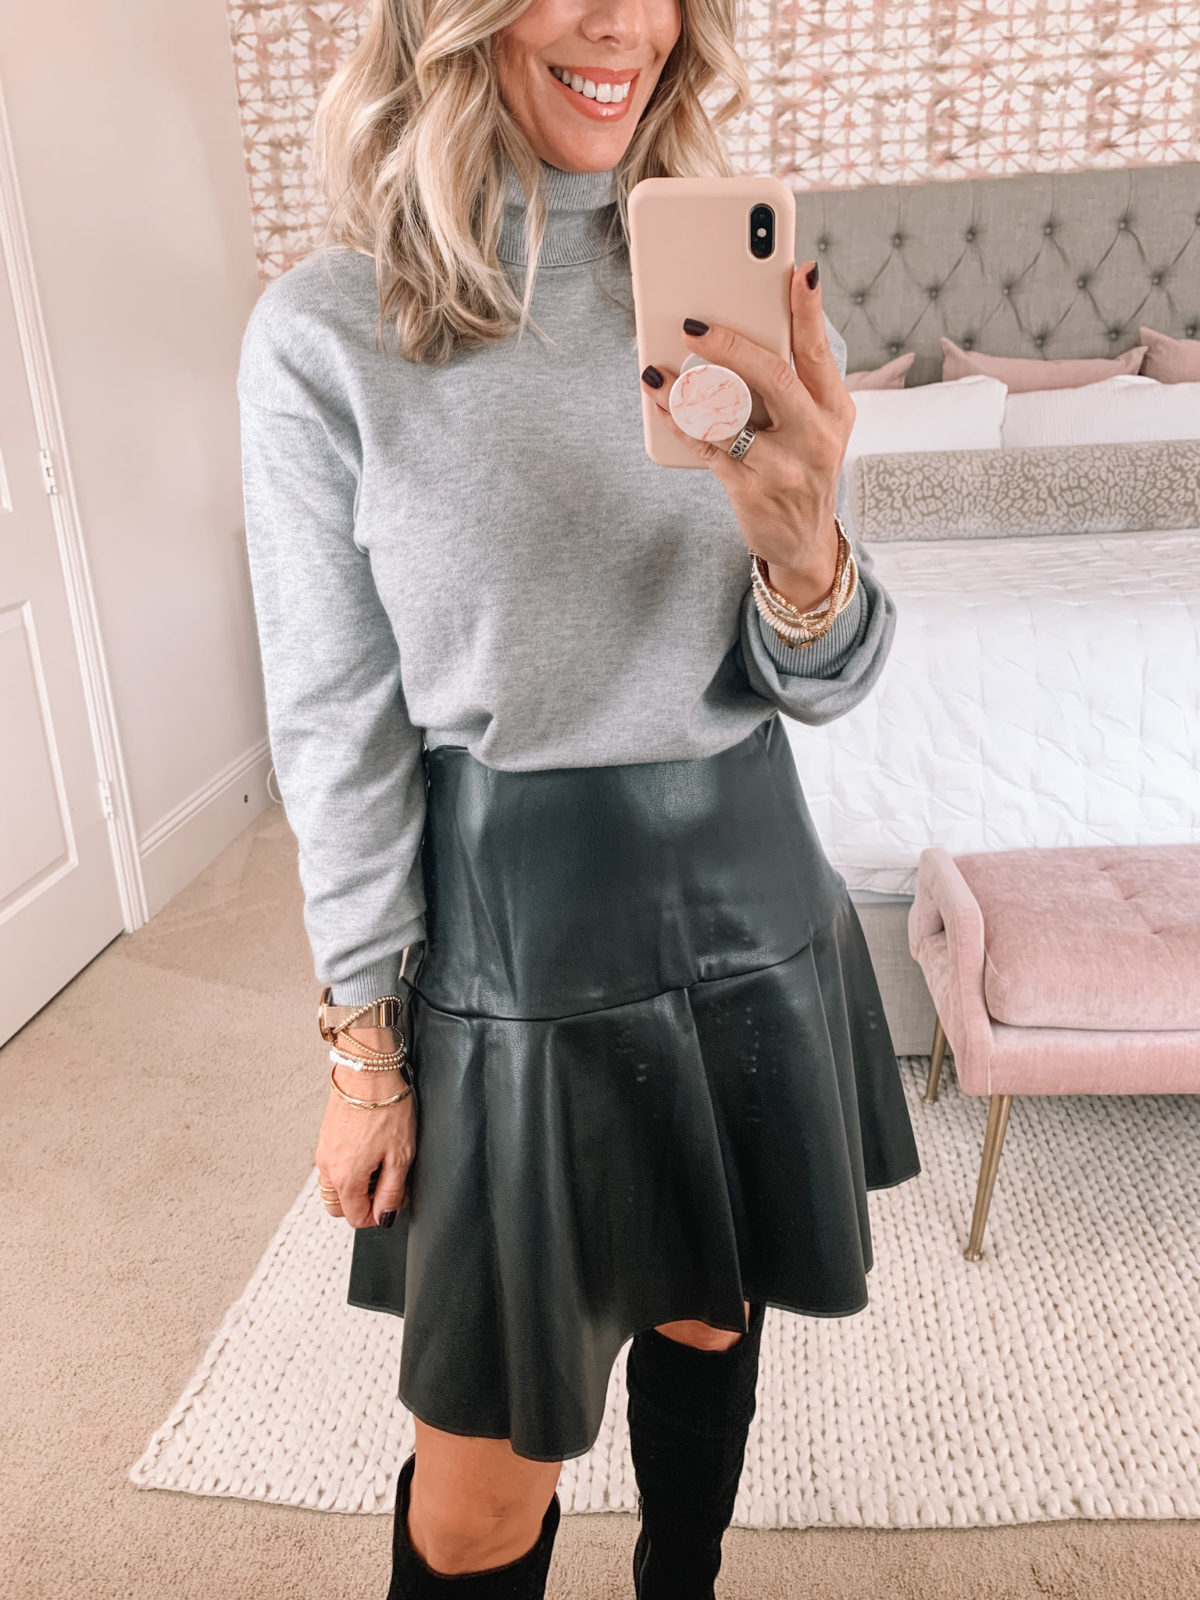 Walmart Fashion, Tunic Turtleneck, Vegan Leather Mini Skirt, Boots